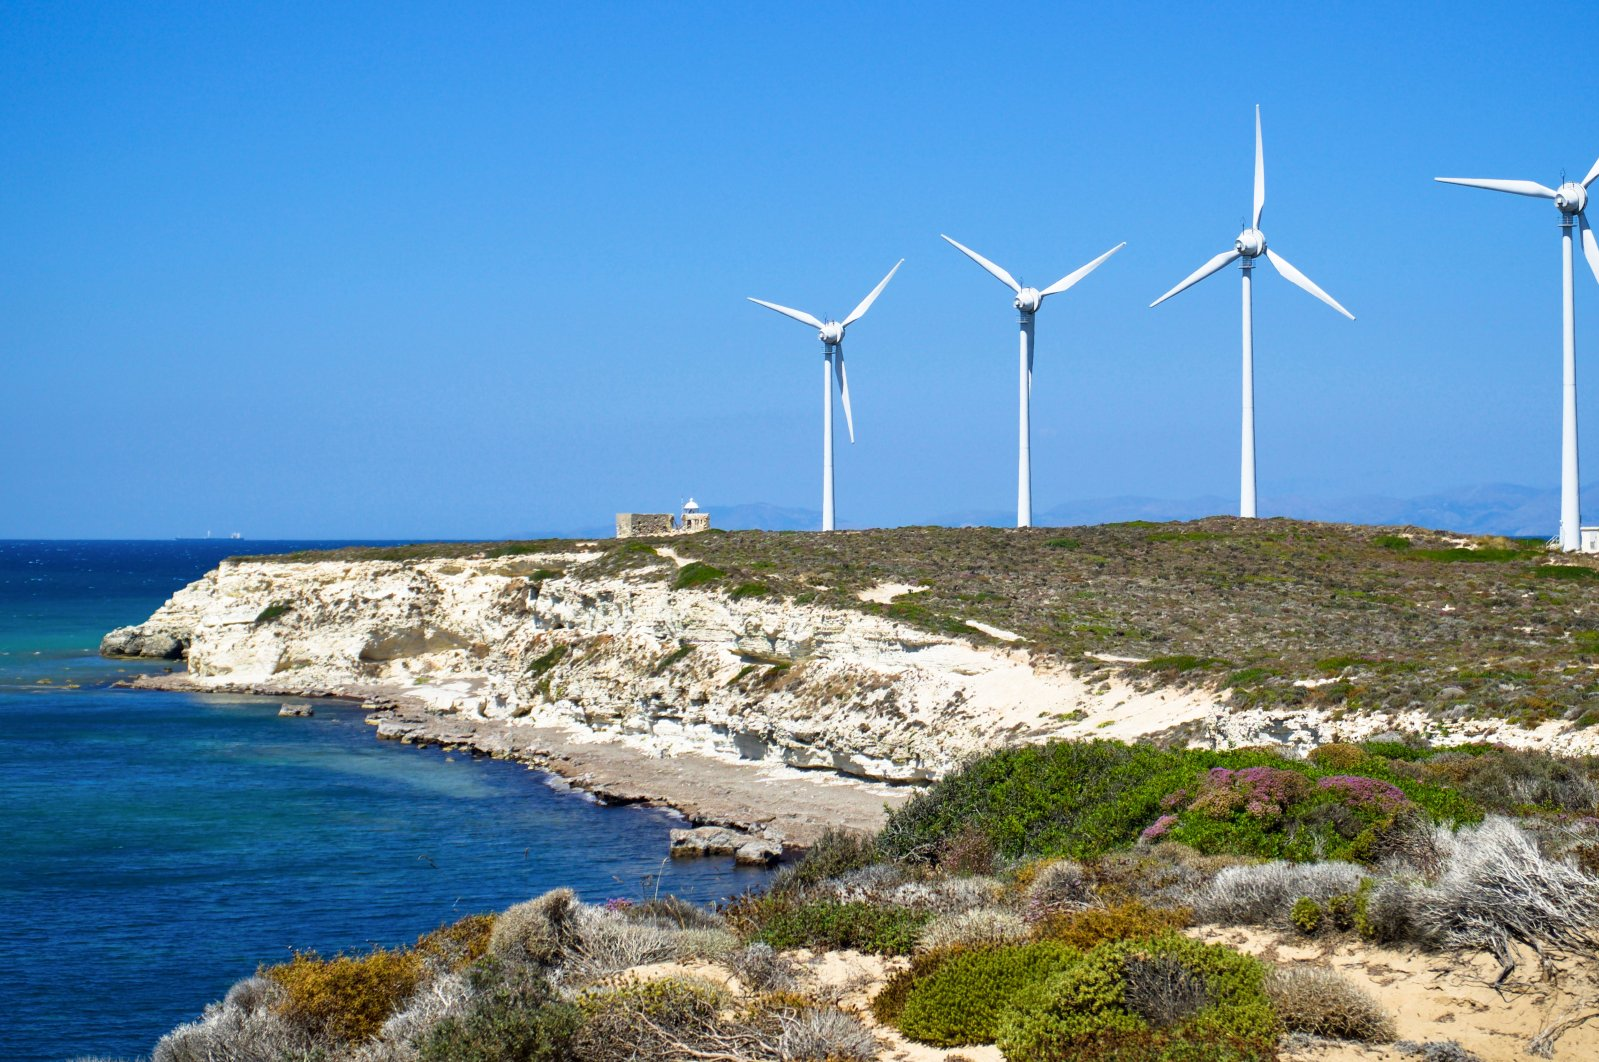 Wind turbines seen in a wind energy farm in this undated file photo, Bozcaada, Çanakkale, northwestern Turkey. (Shutterstock Photo)